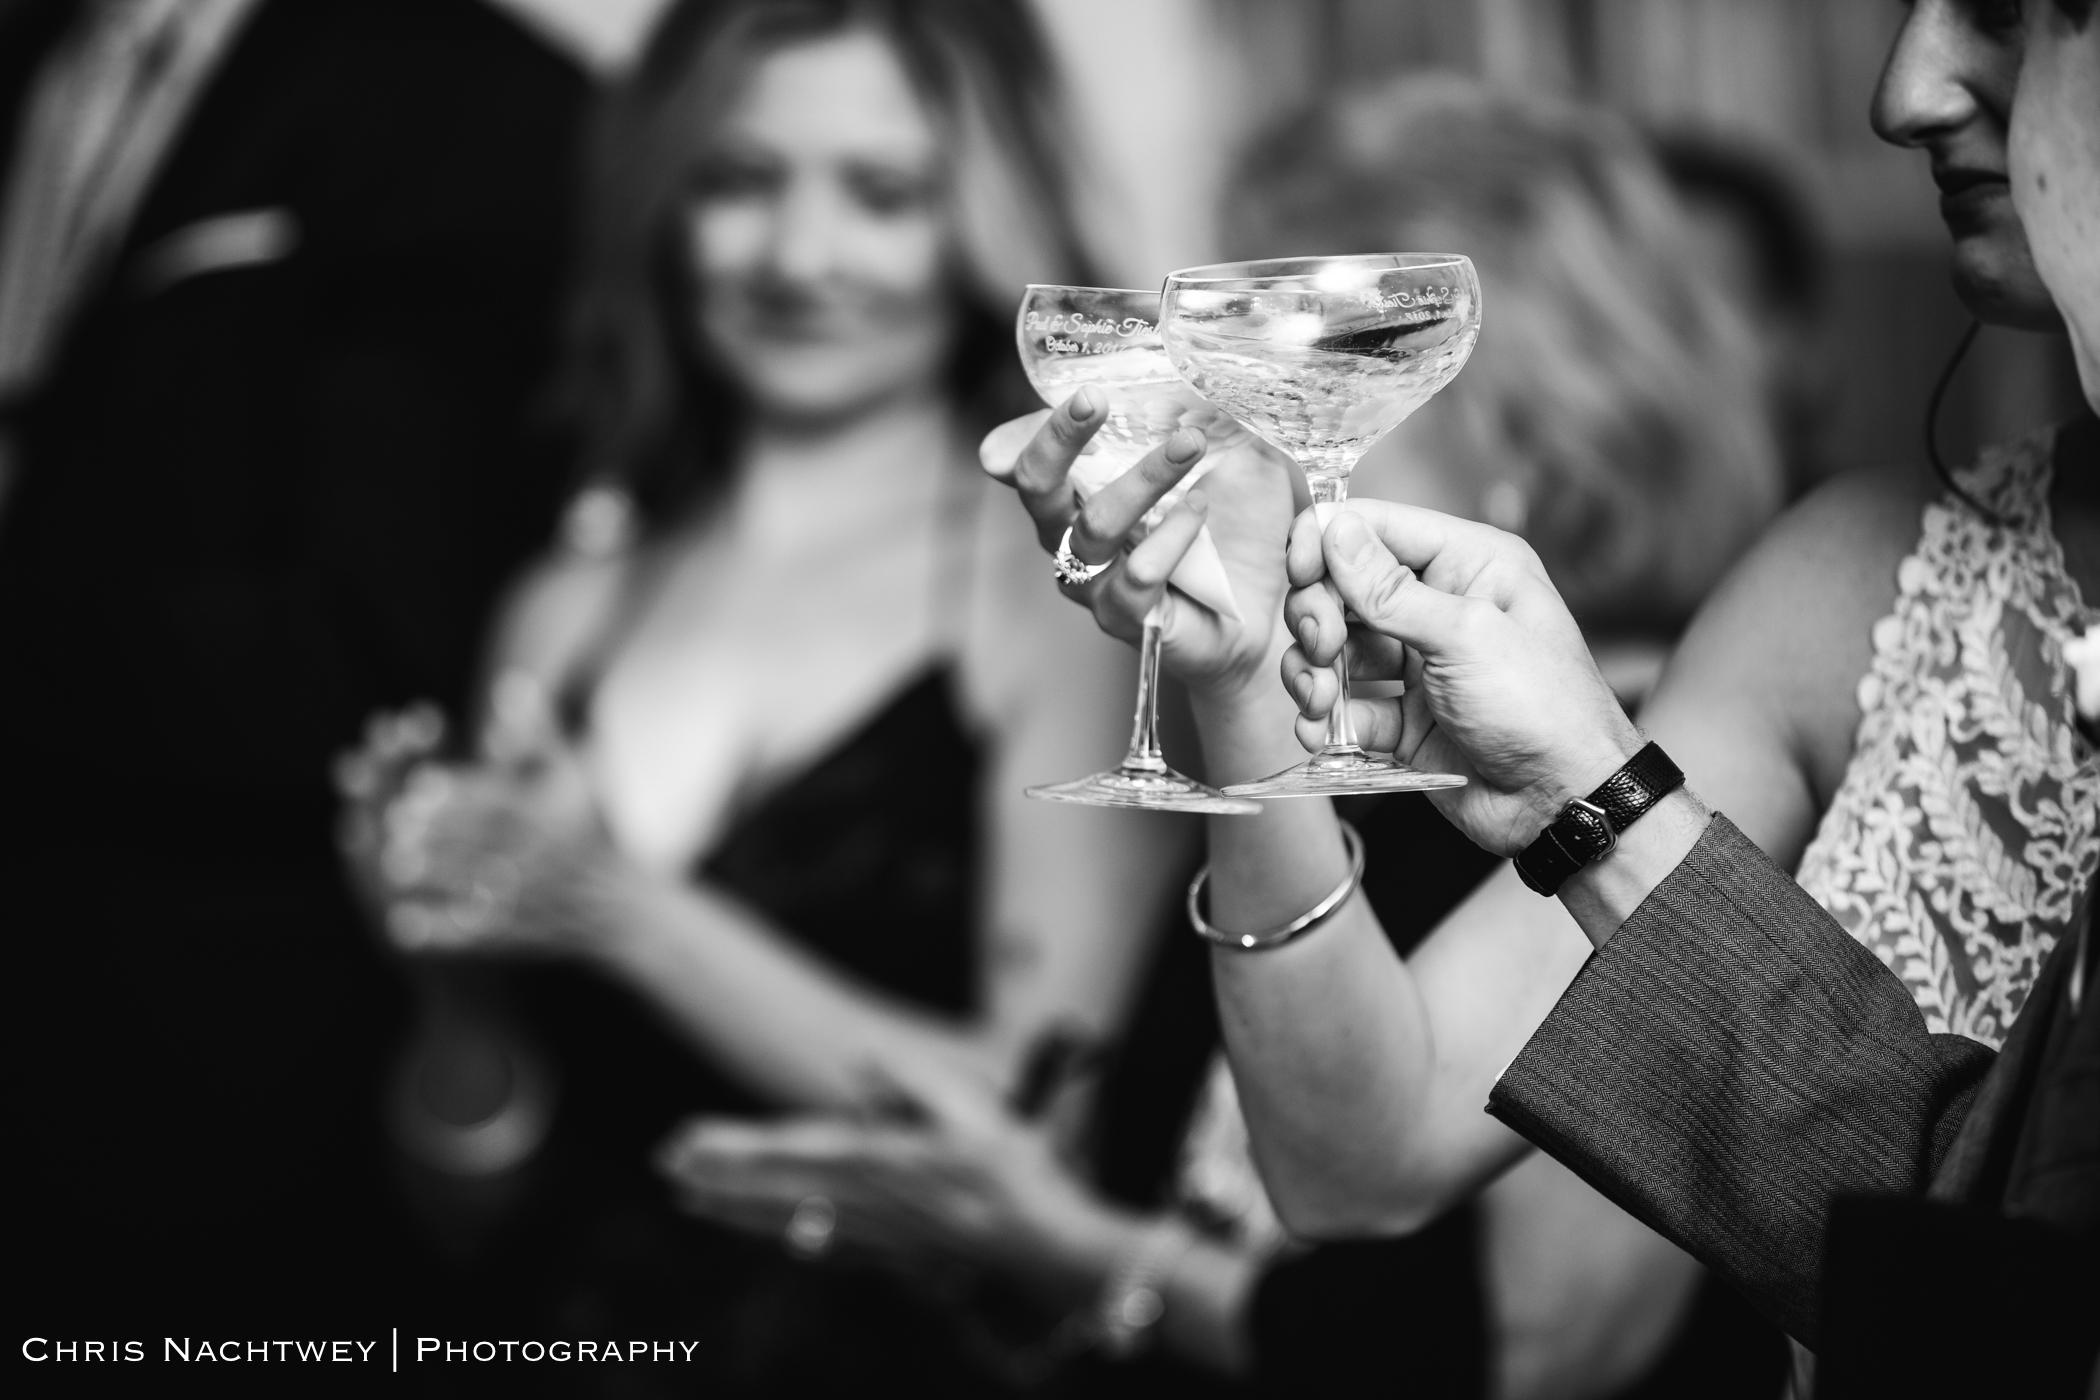 harkness-wedding-photos-chris-nachtwey-photography-2018-31.jpg